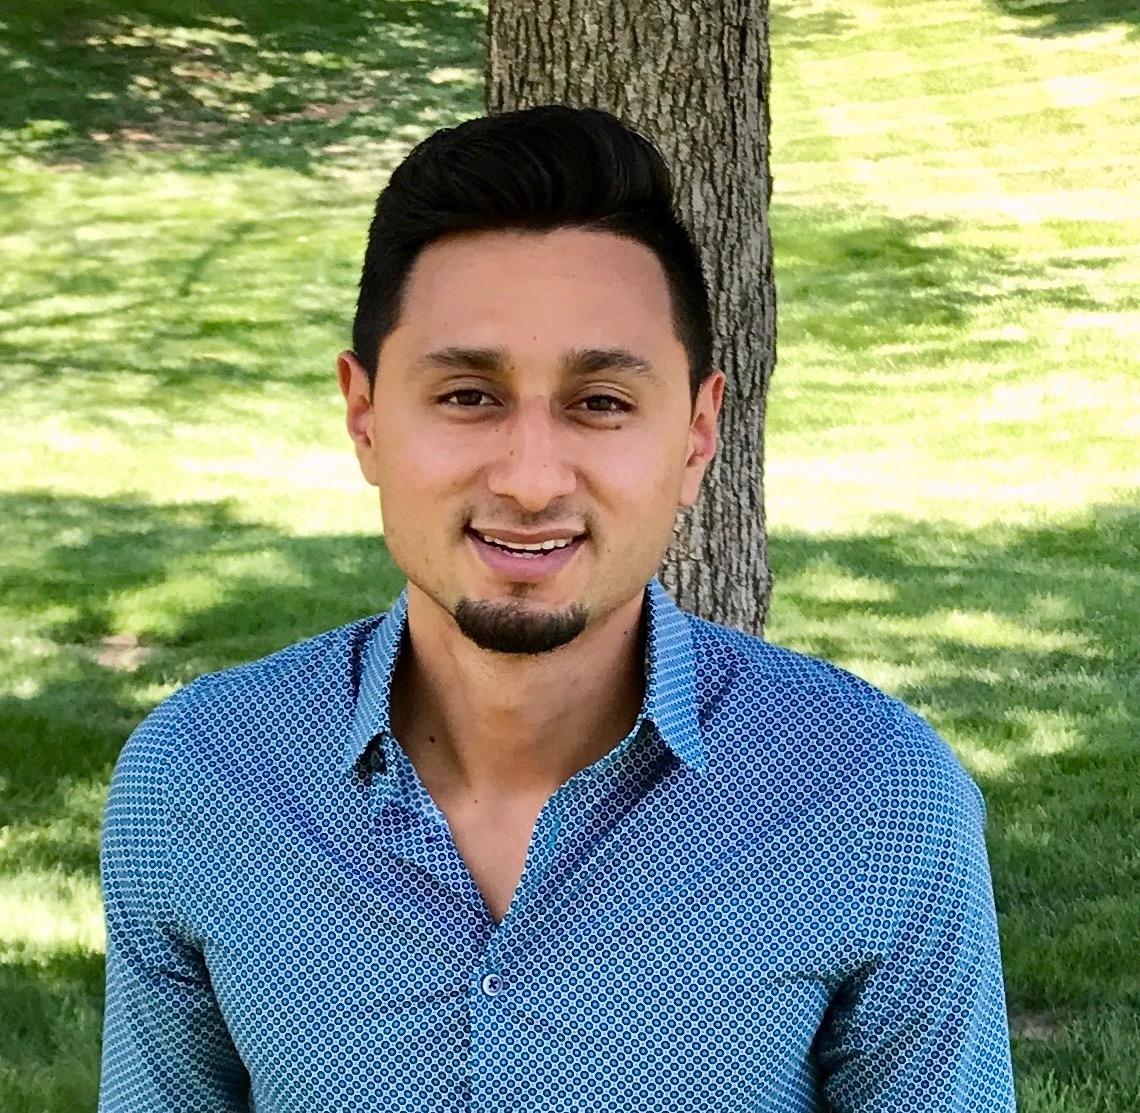 Josh Camacho Bungii Founder Startup Entrepreneur